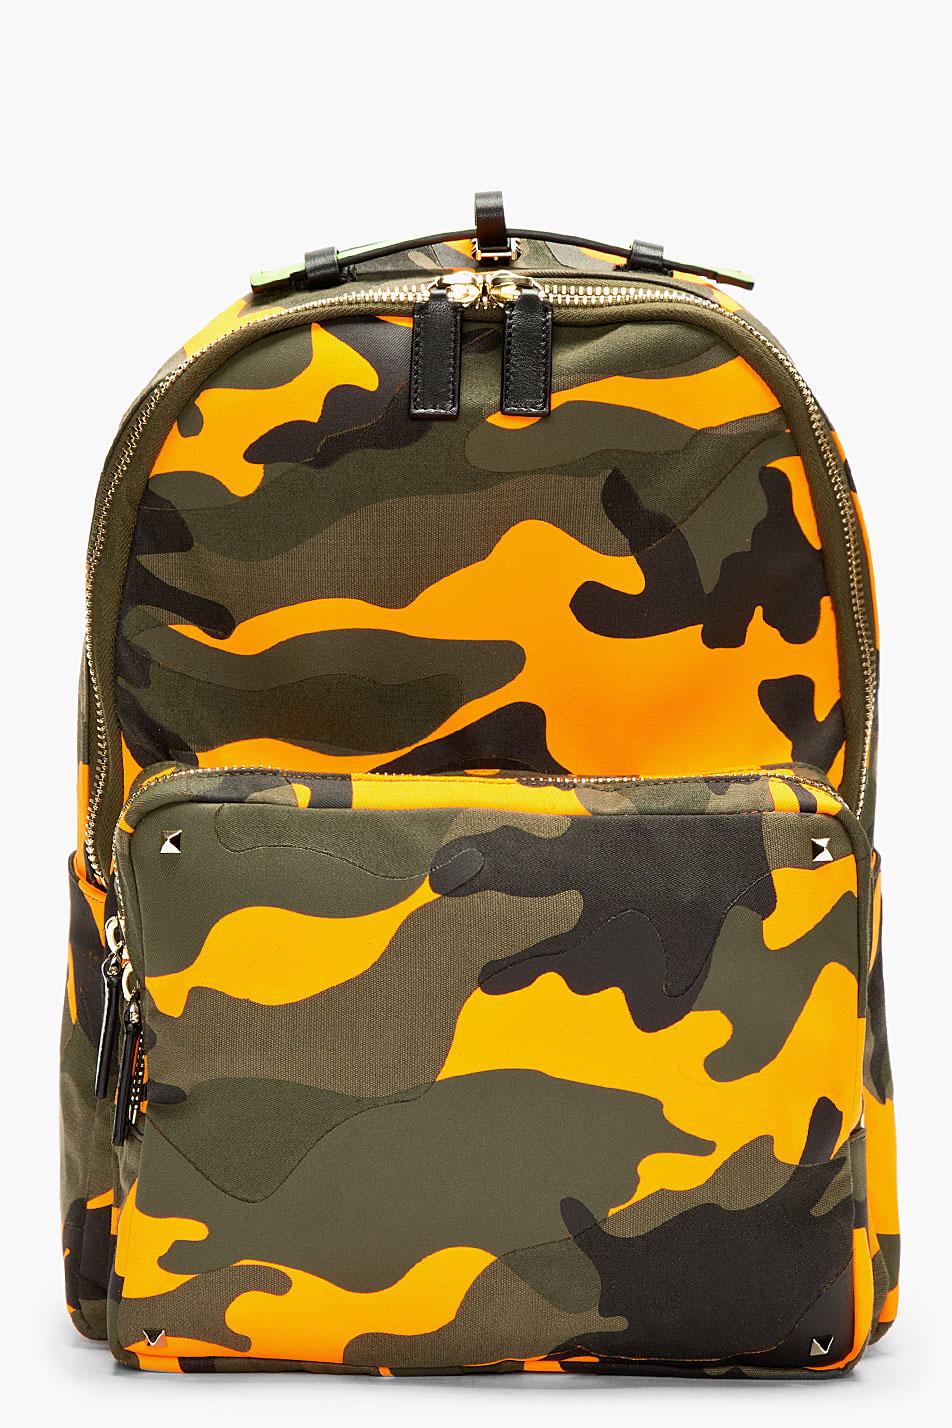 Valentino Orange Camo Backpack In Green For Men Lyst